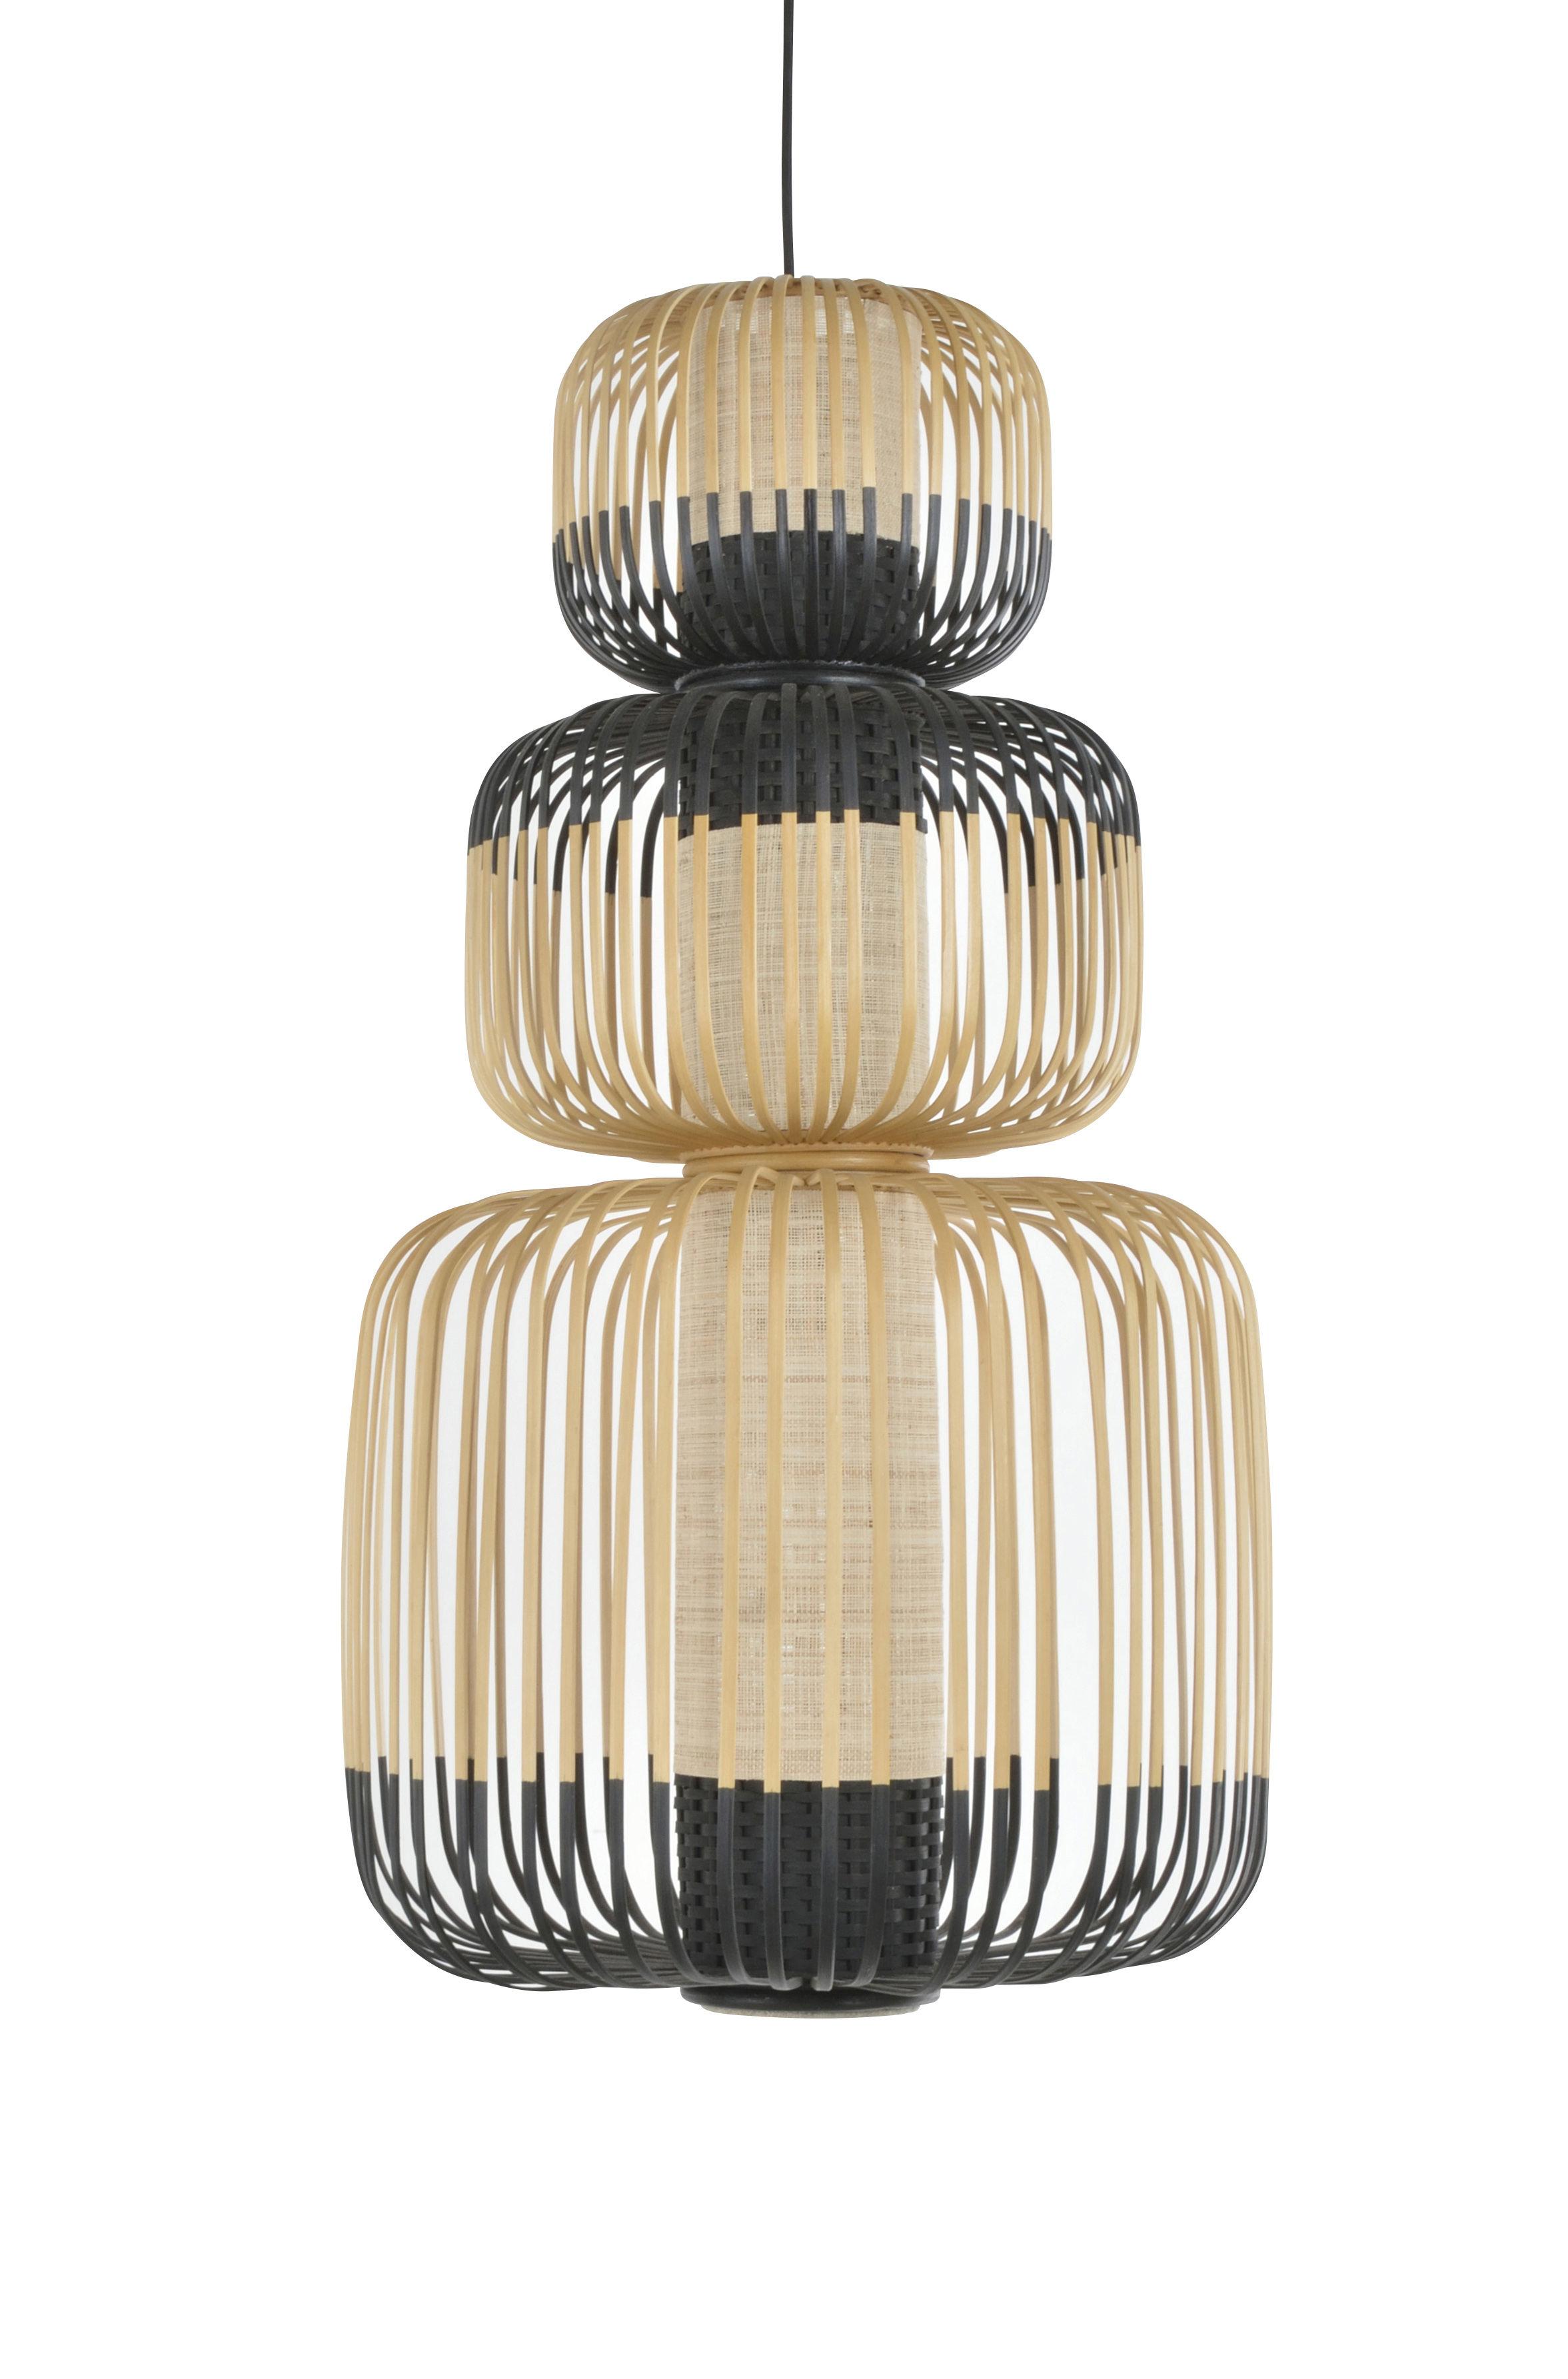 Illuminazione - Lampadari - Sospensione Totem Bamboo Light - / 3 paralumi - H 115 cm di Forestier - H 115 cm / Nero & naturale - Bambù, Tessuto